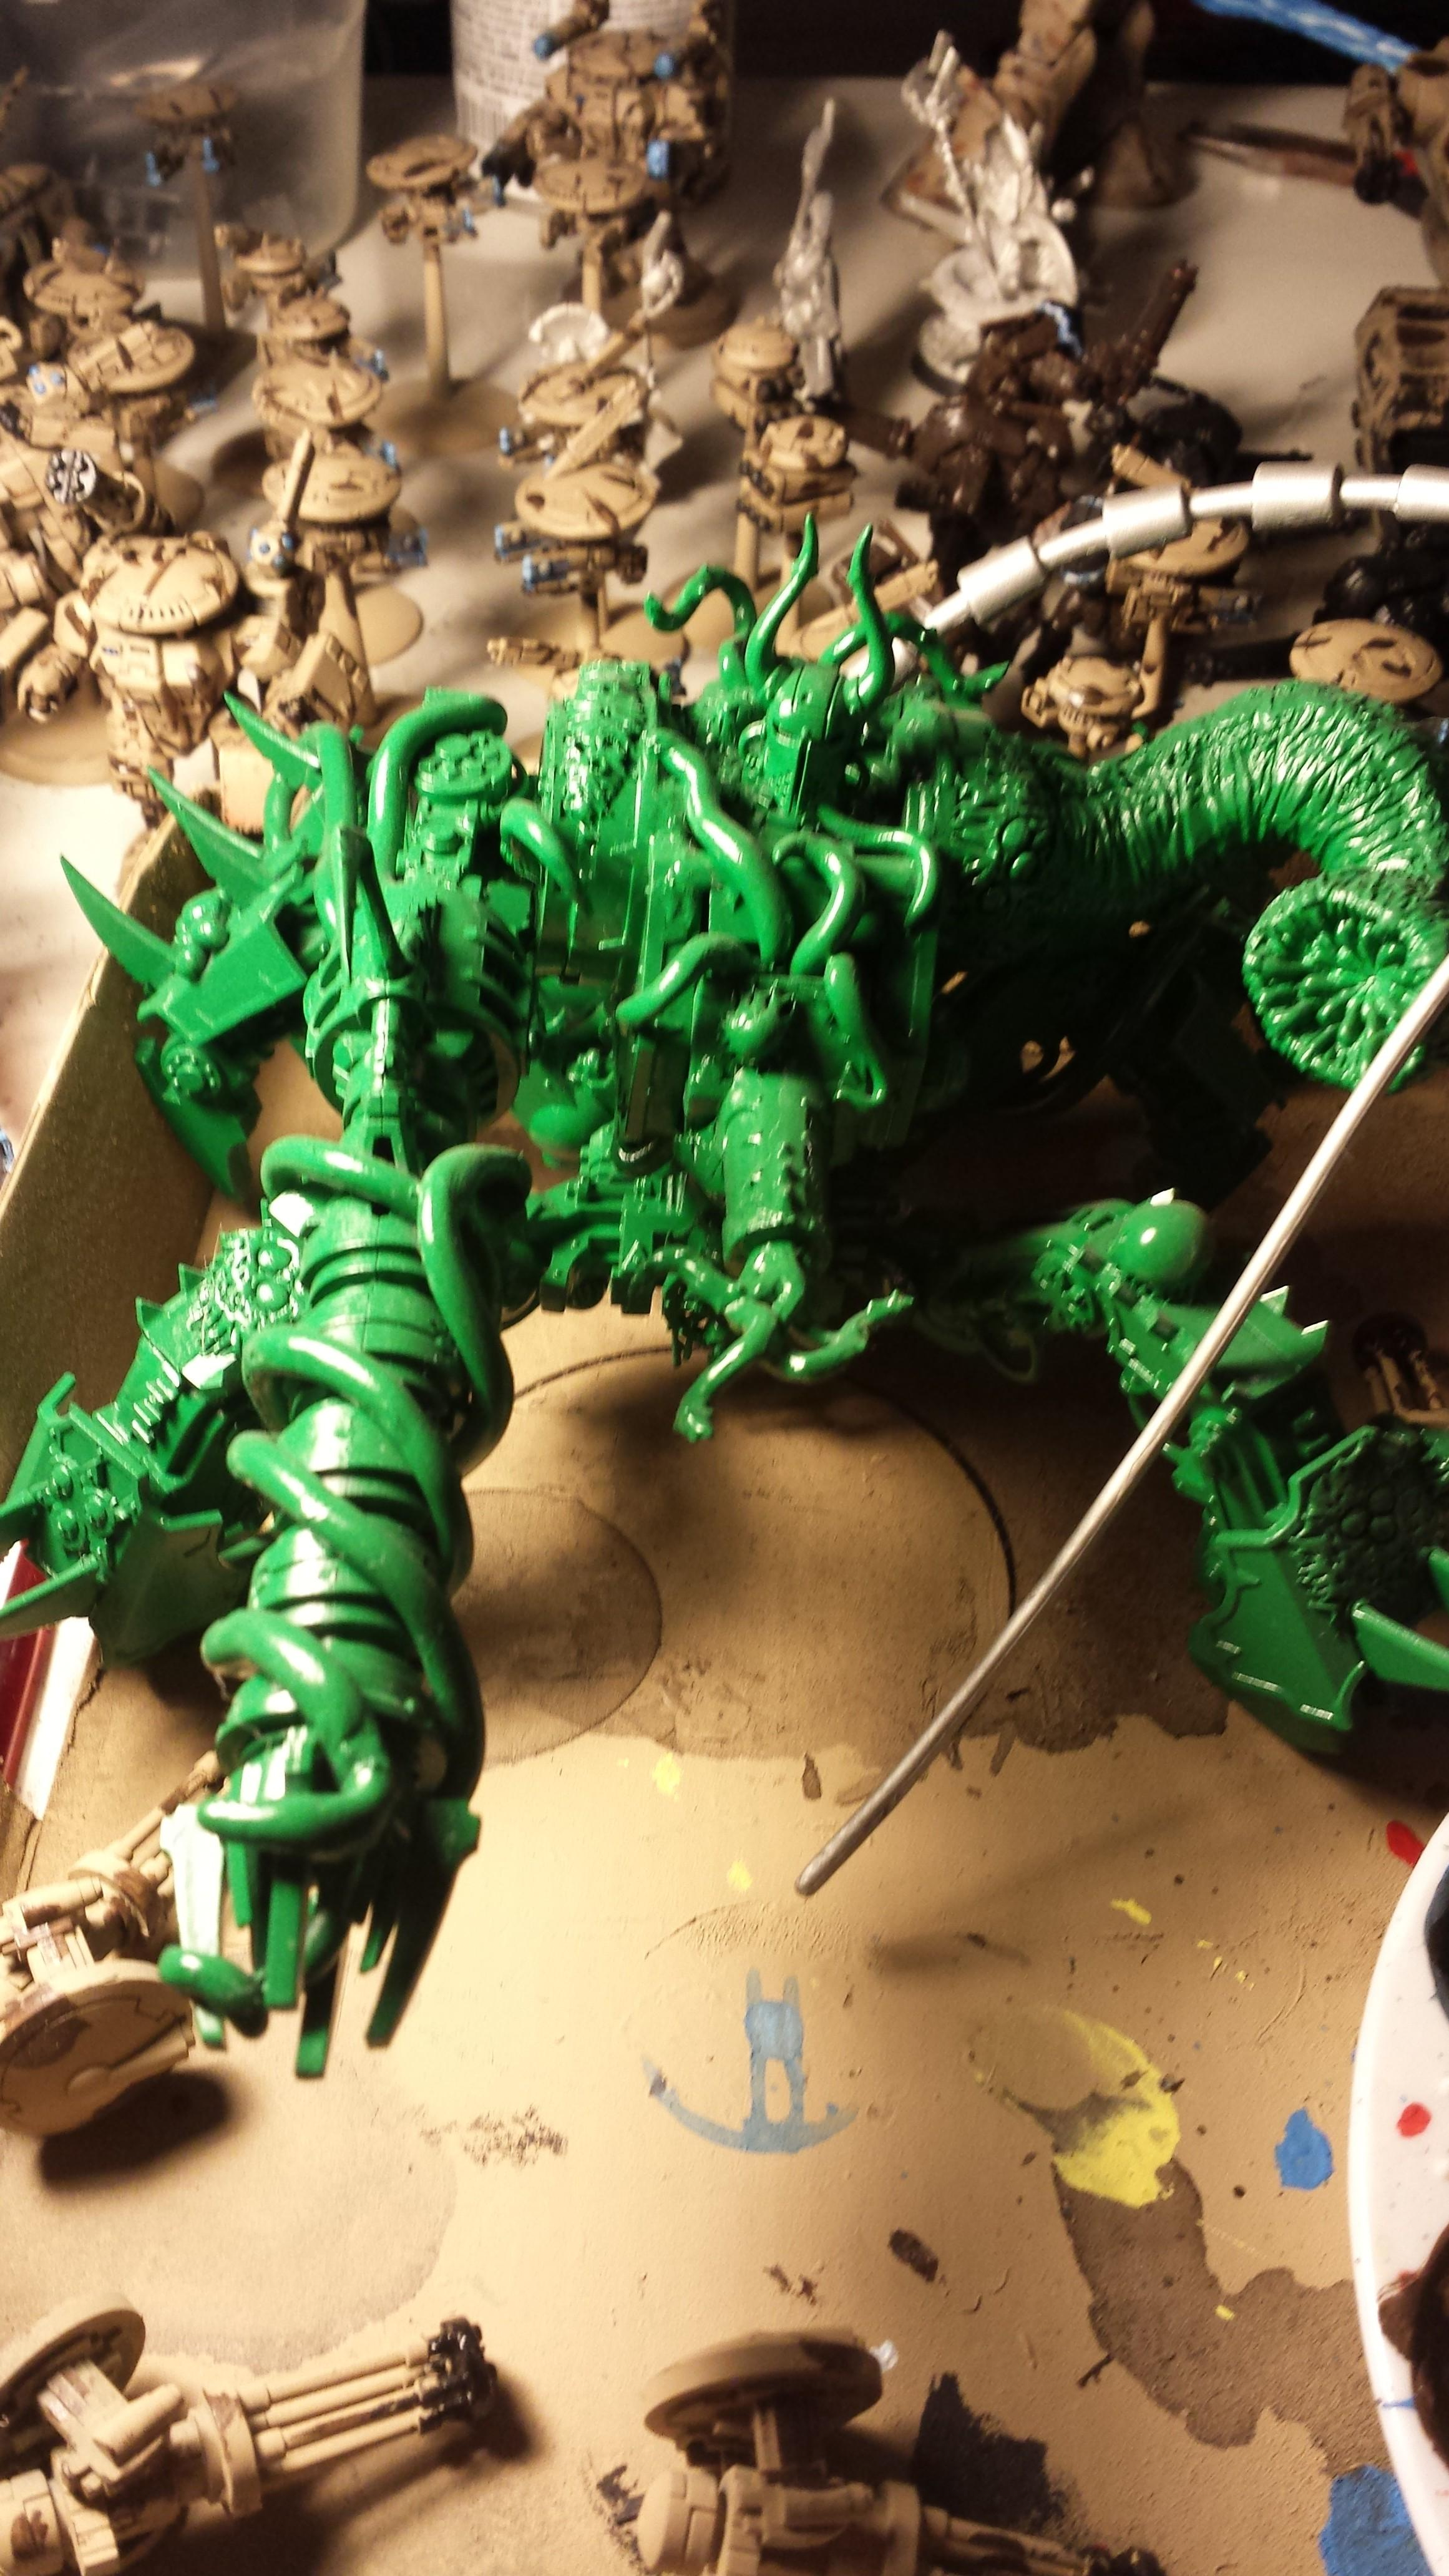 Chaos, Chaos Space Marines, Conversion, Cultist, Custom, Defiler, Evil, Gods Of Chaos, Green, Greenstuff, Nurgle, Obliterators, Plague, Space Marines, Stuff, Termi, Terminator Armor, Typhus, Zombie